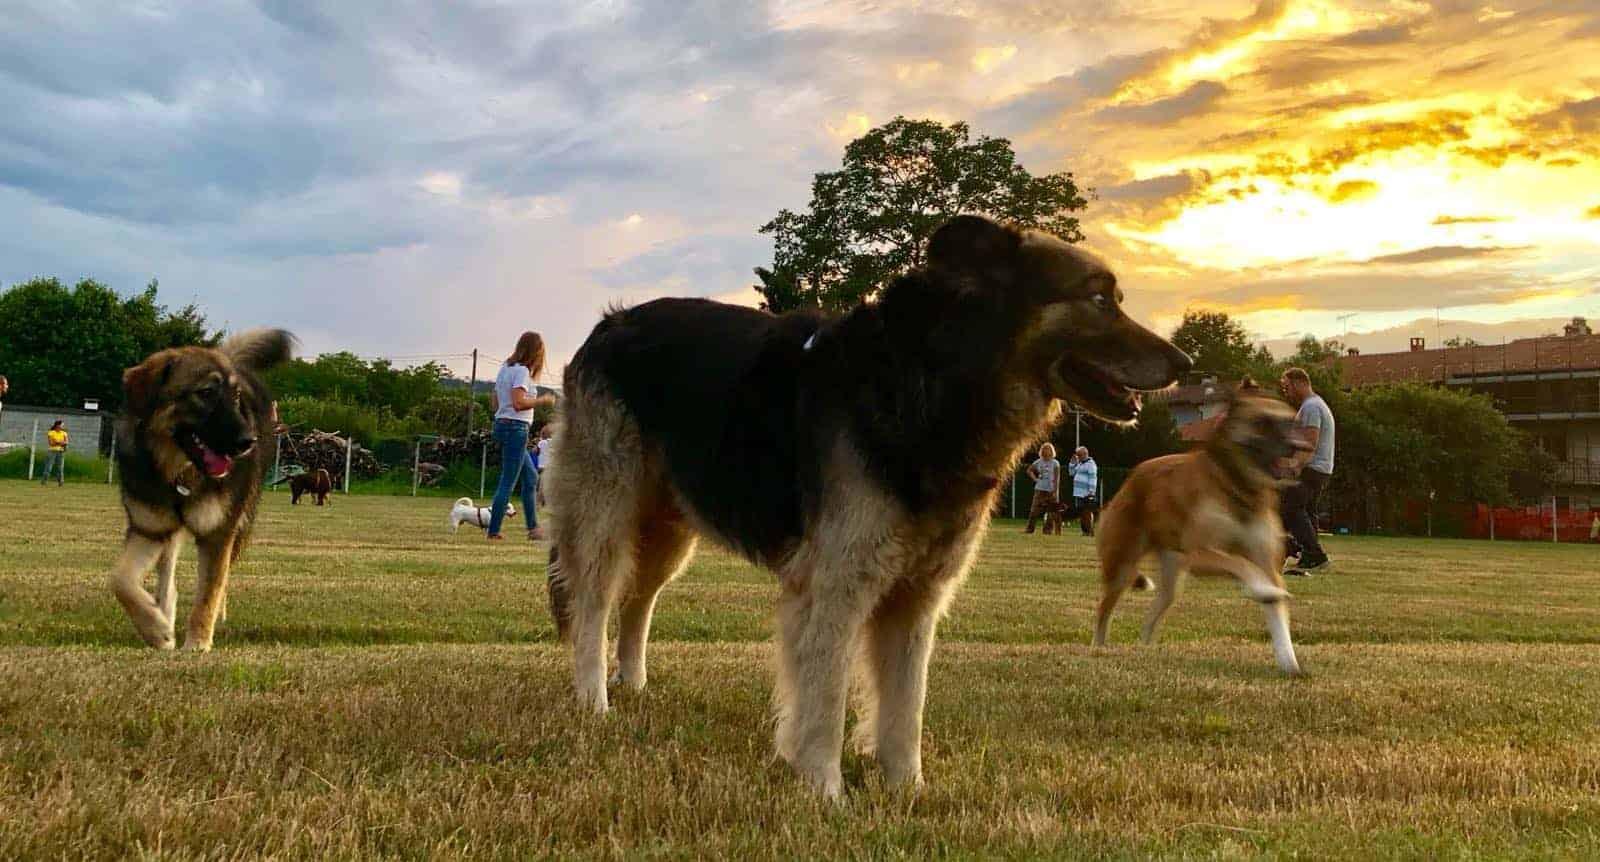 I tre cani al tramonto